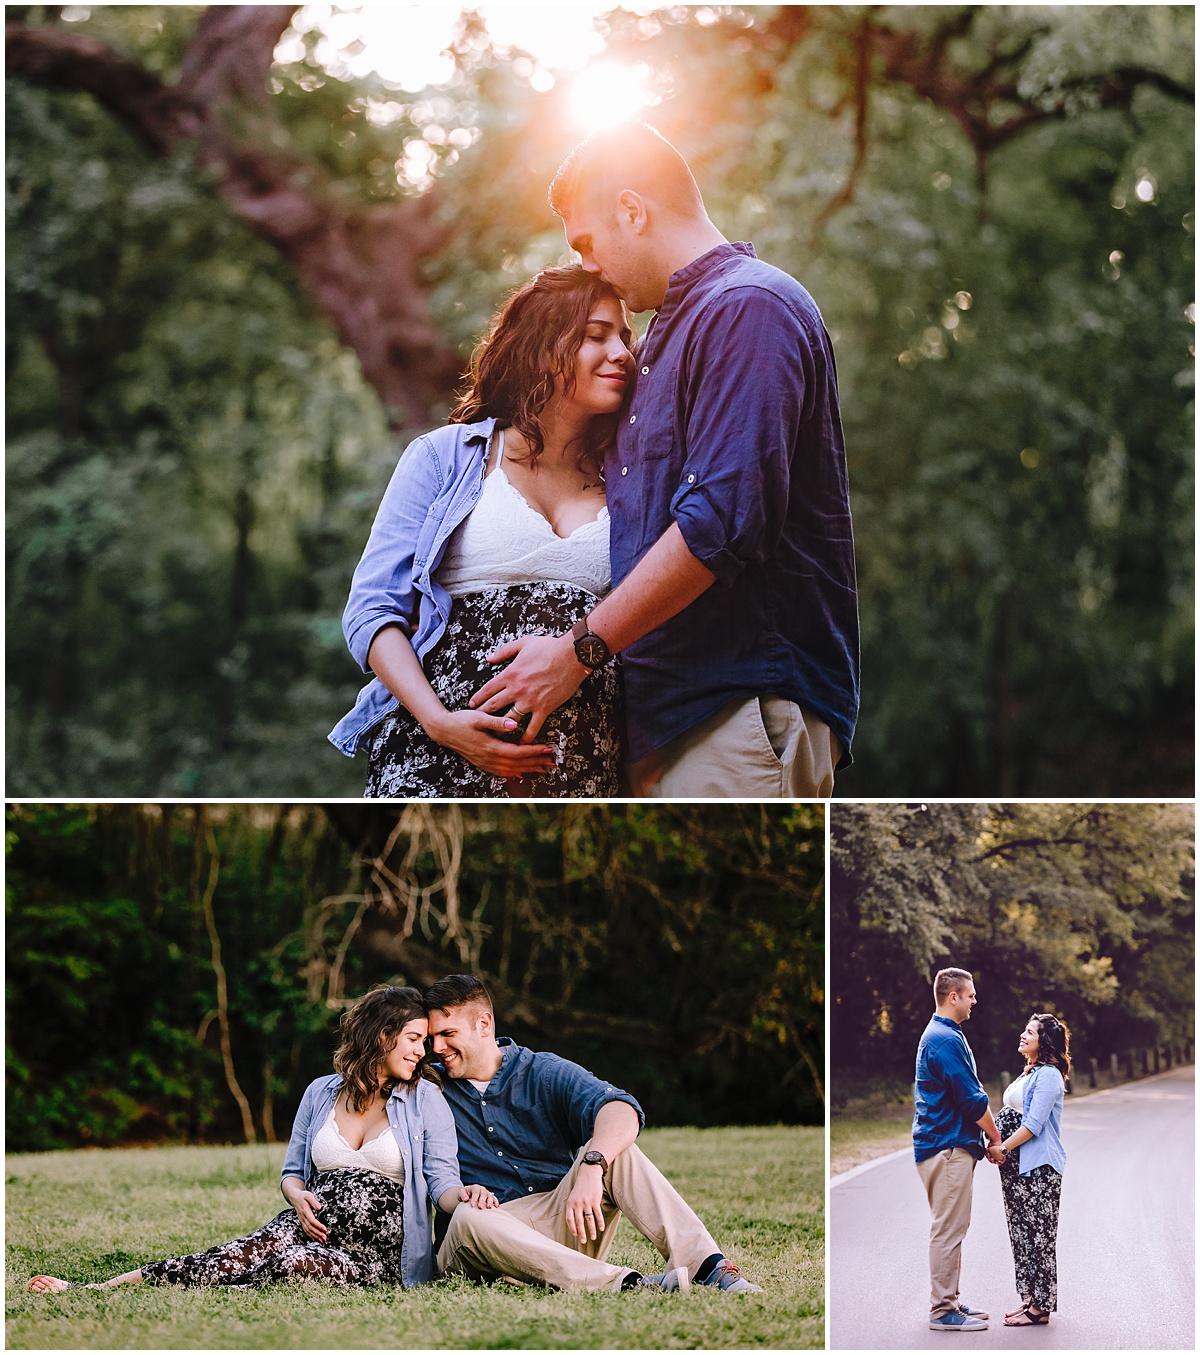 Maternity-Photo-Session-Brakenridge-Park-San-Antonio-Texas-Carly-Barton-Photography_0008.jpg